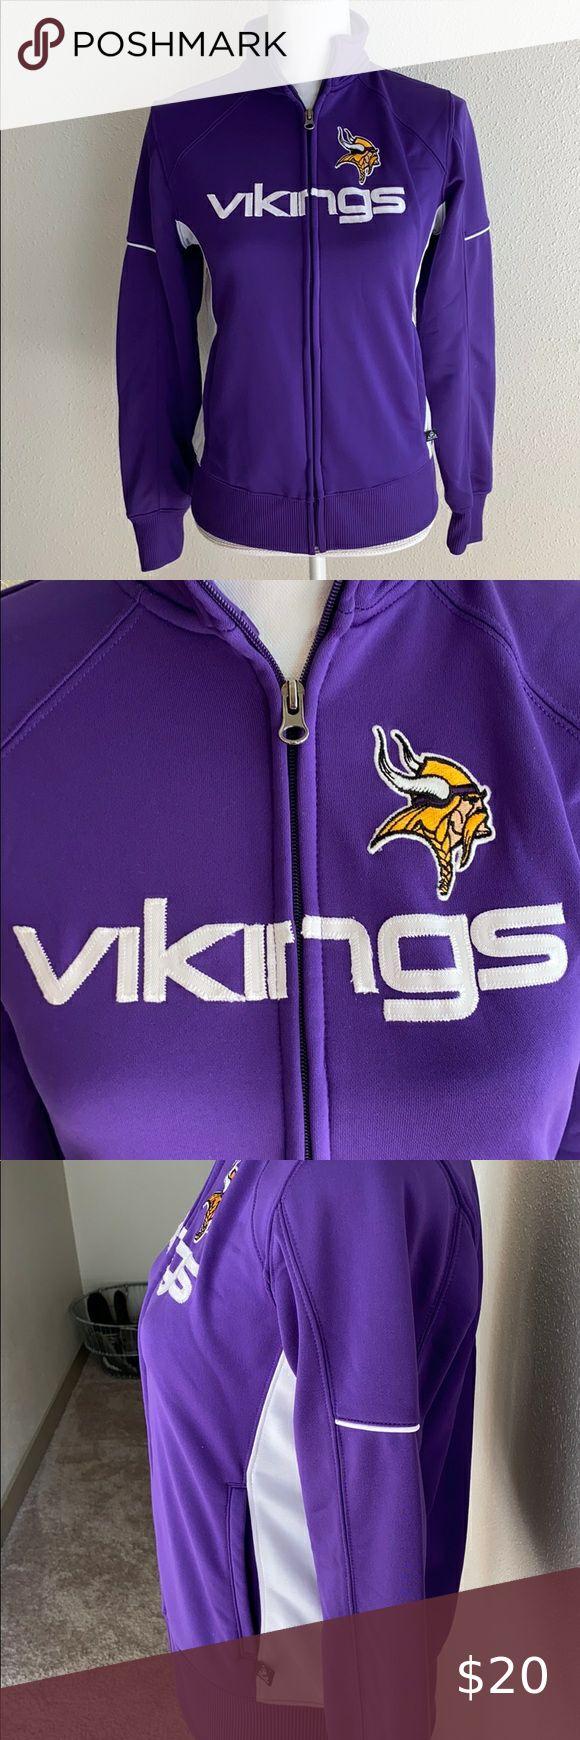 Nfl Team Apparel Minnesota Vikings Zip Up Jacket In 2020 Team Apparel Nfl Team Apparel Jackets [ 1740 x 580 Pixel ]